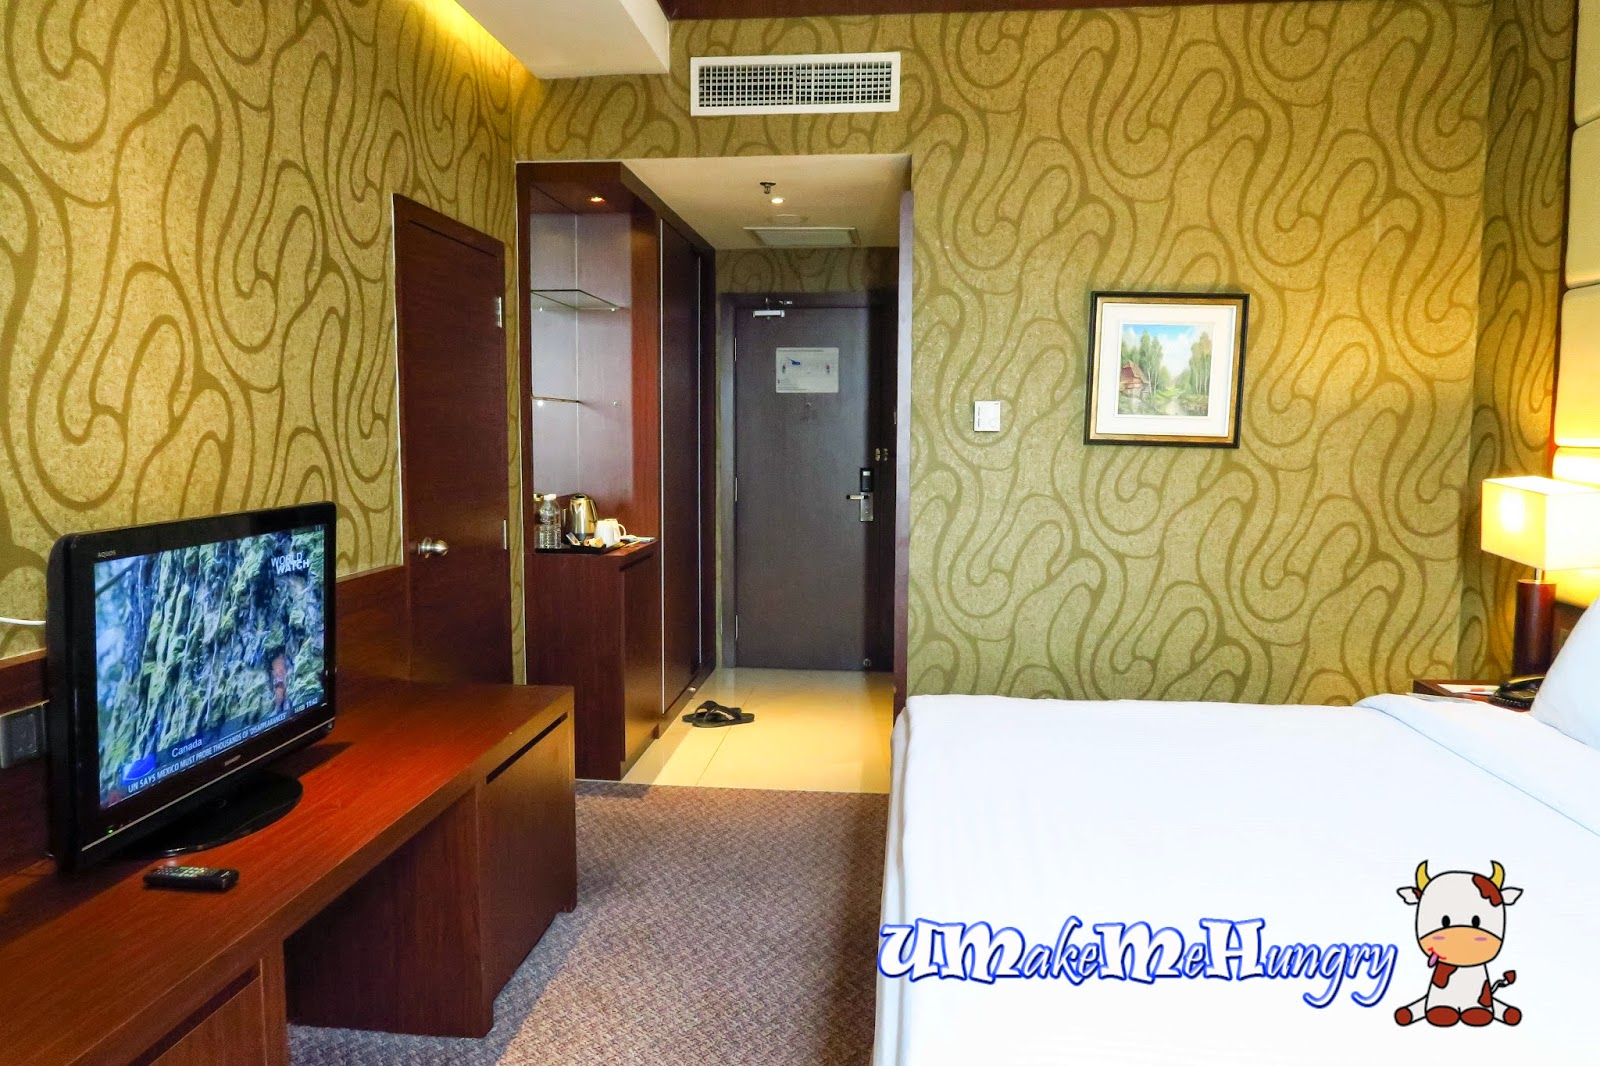 Ksl Hotel Room Rates